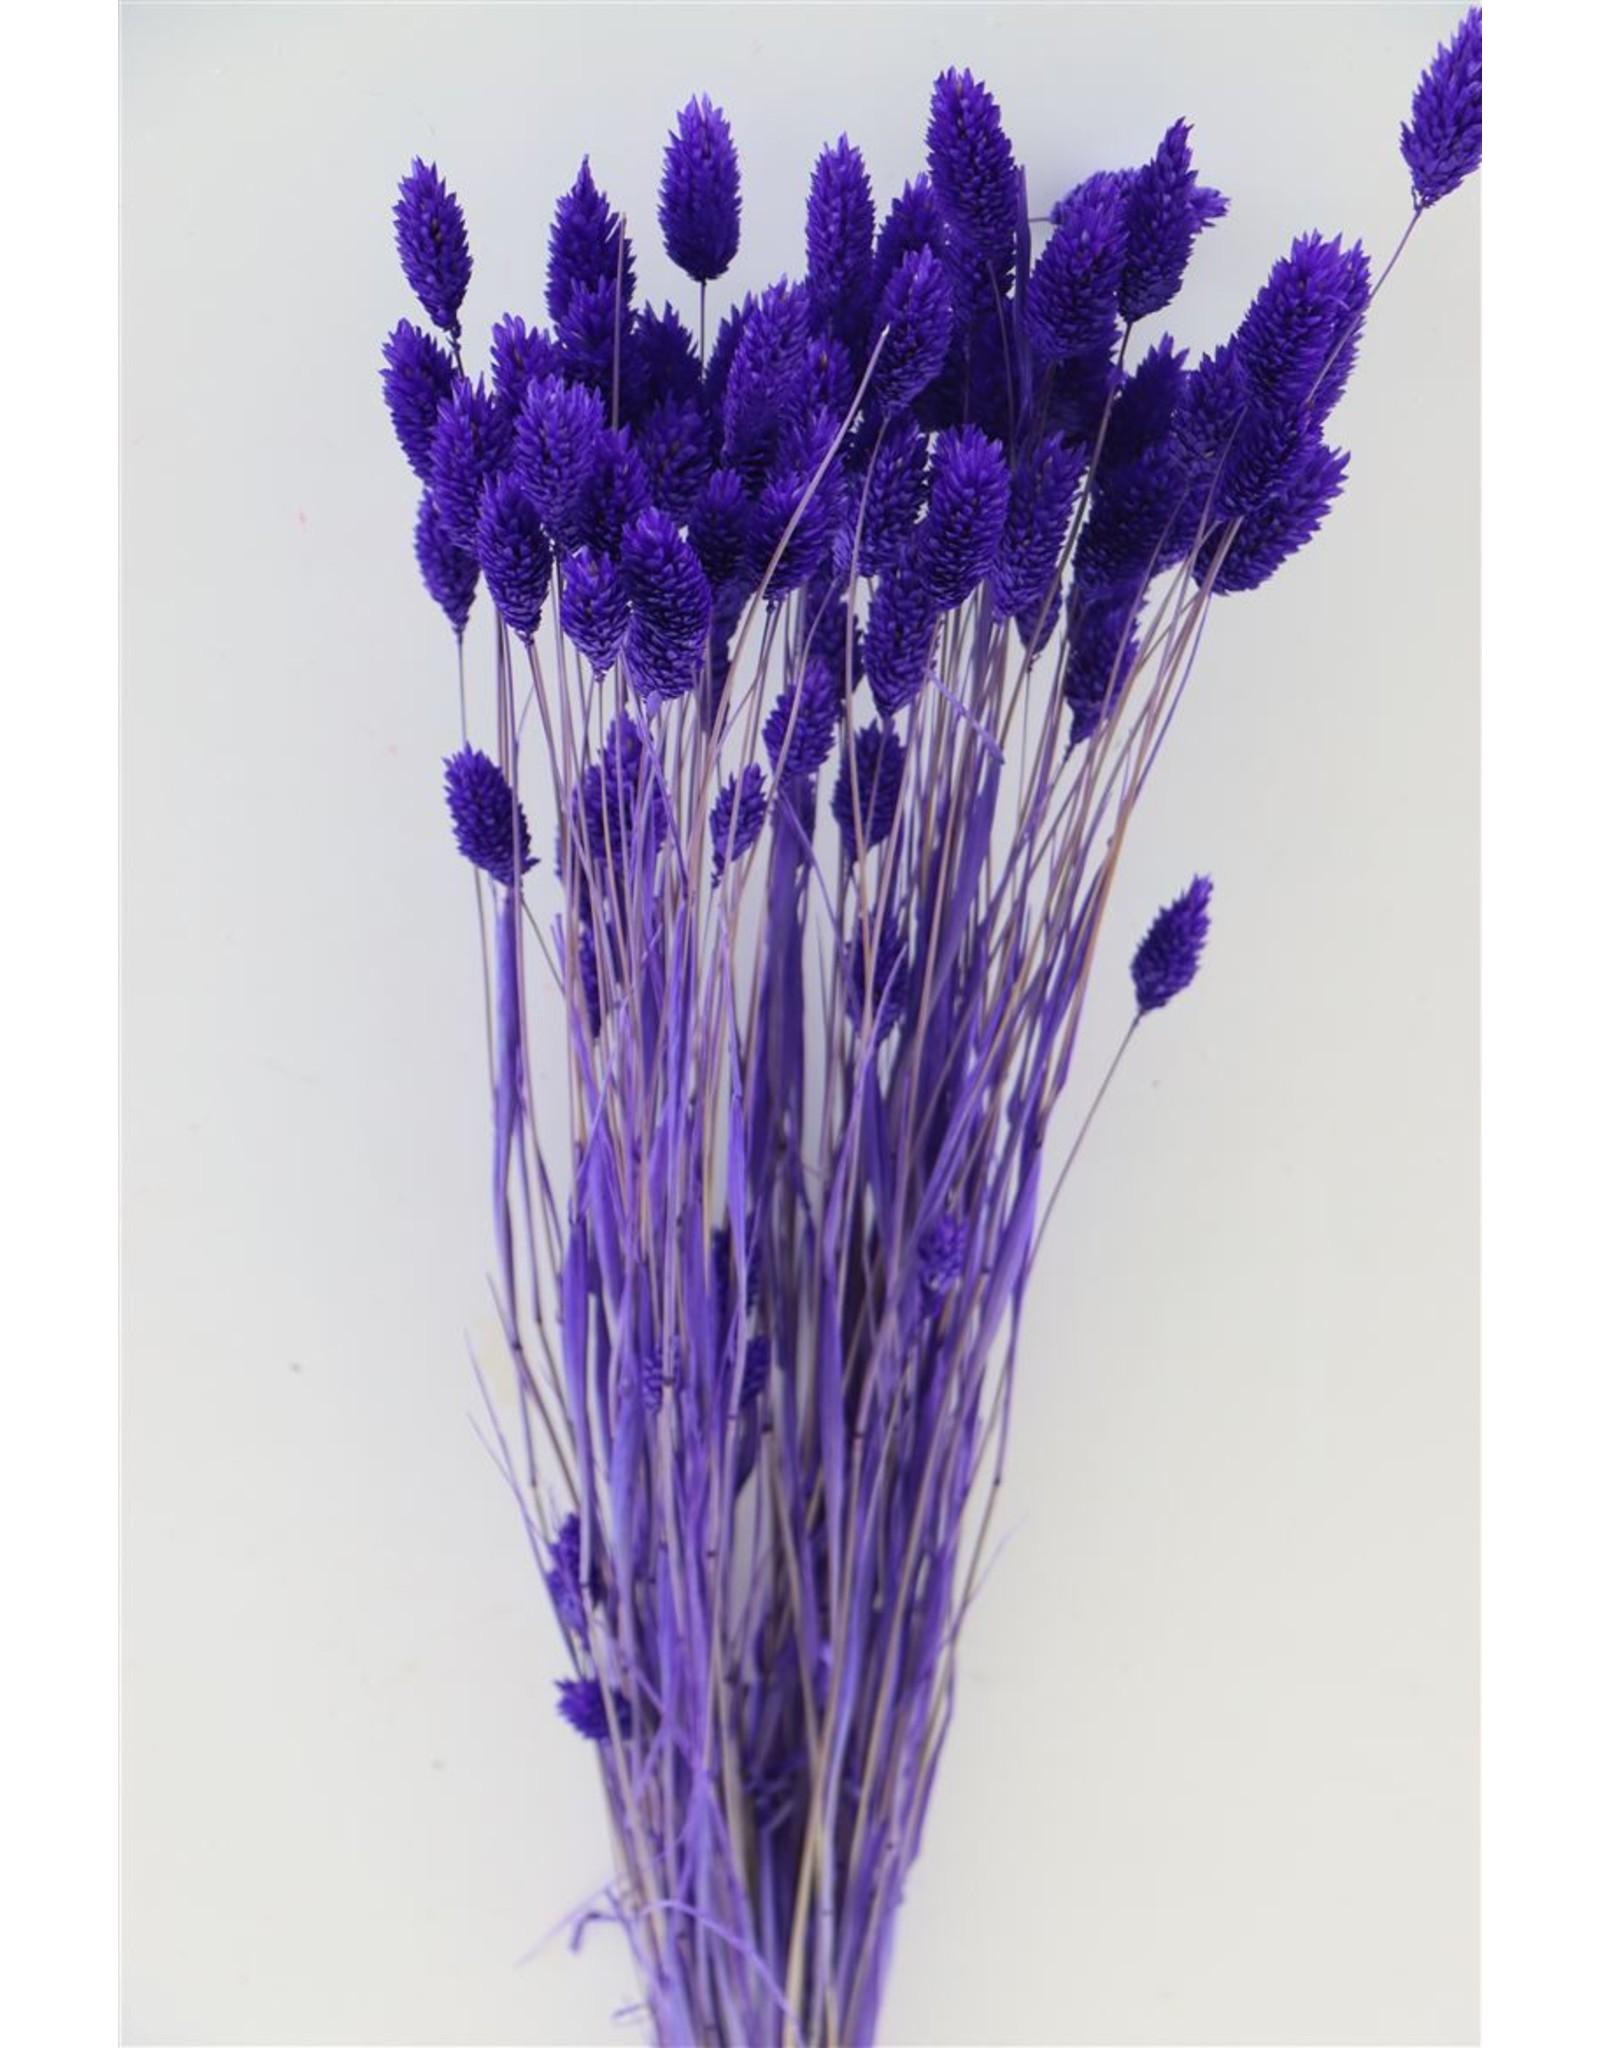 GF Dried Phalaris Violet Bunch x 3